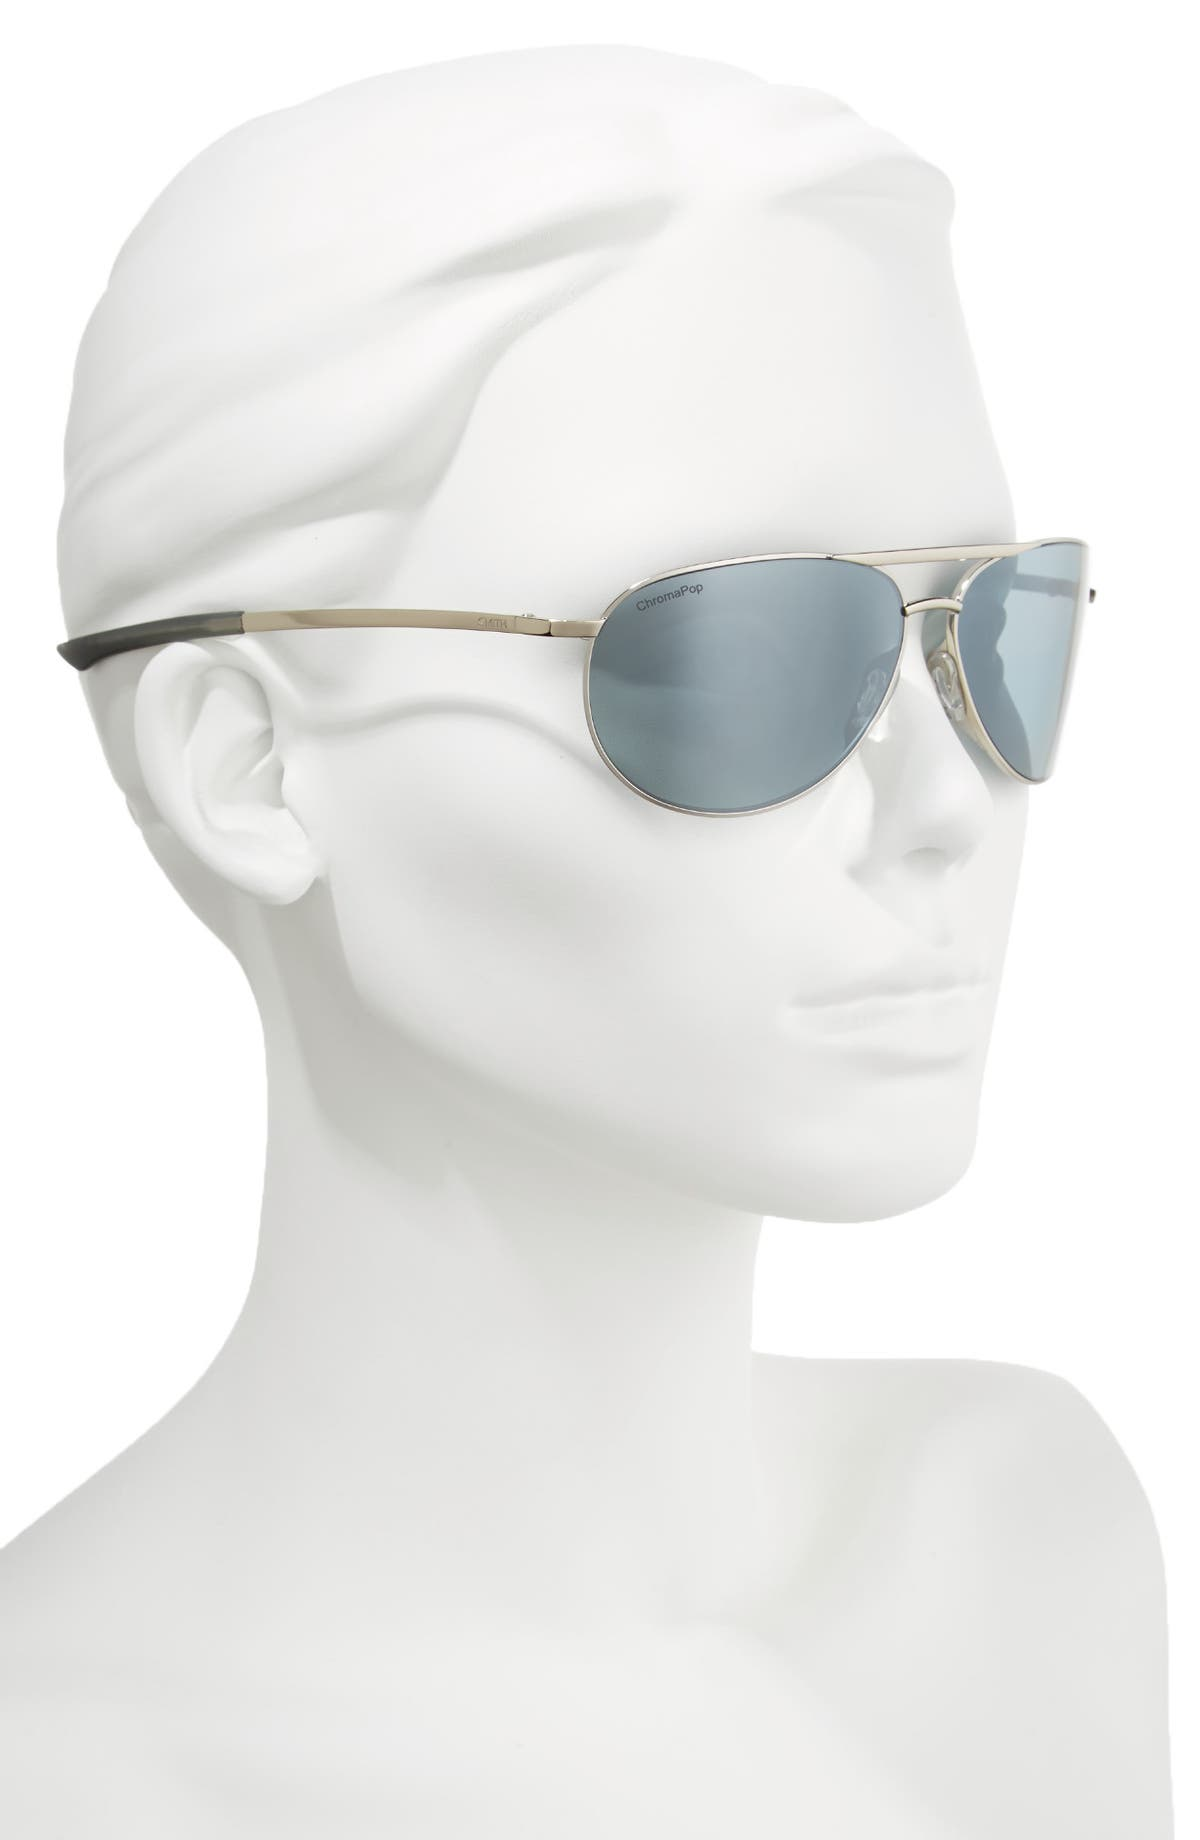 afe7643d24b Smith Serpico Slim 2.0 60mm ChromaPop Polarized Aviator Sunglasses ...